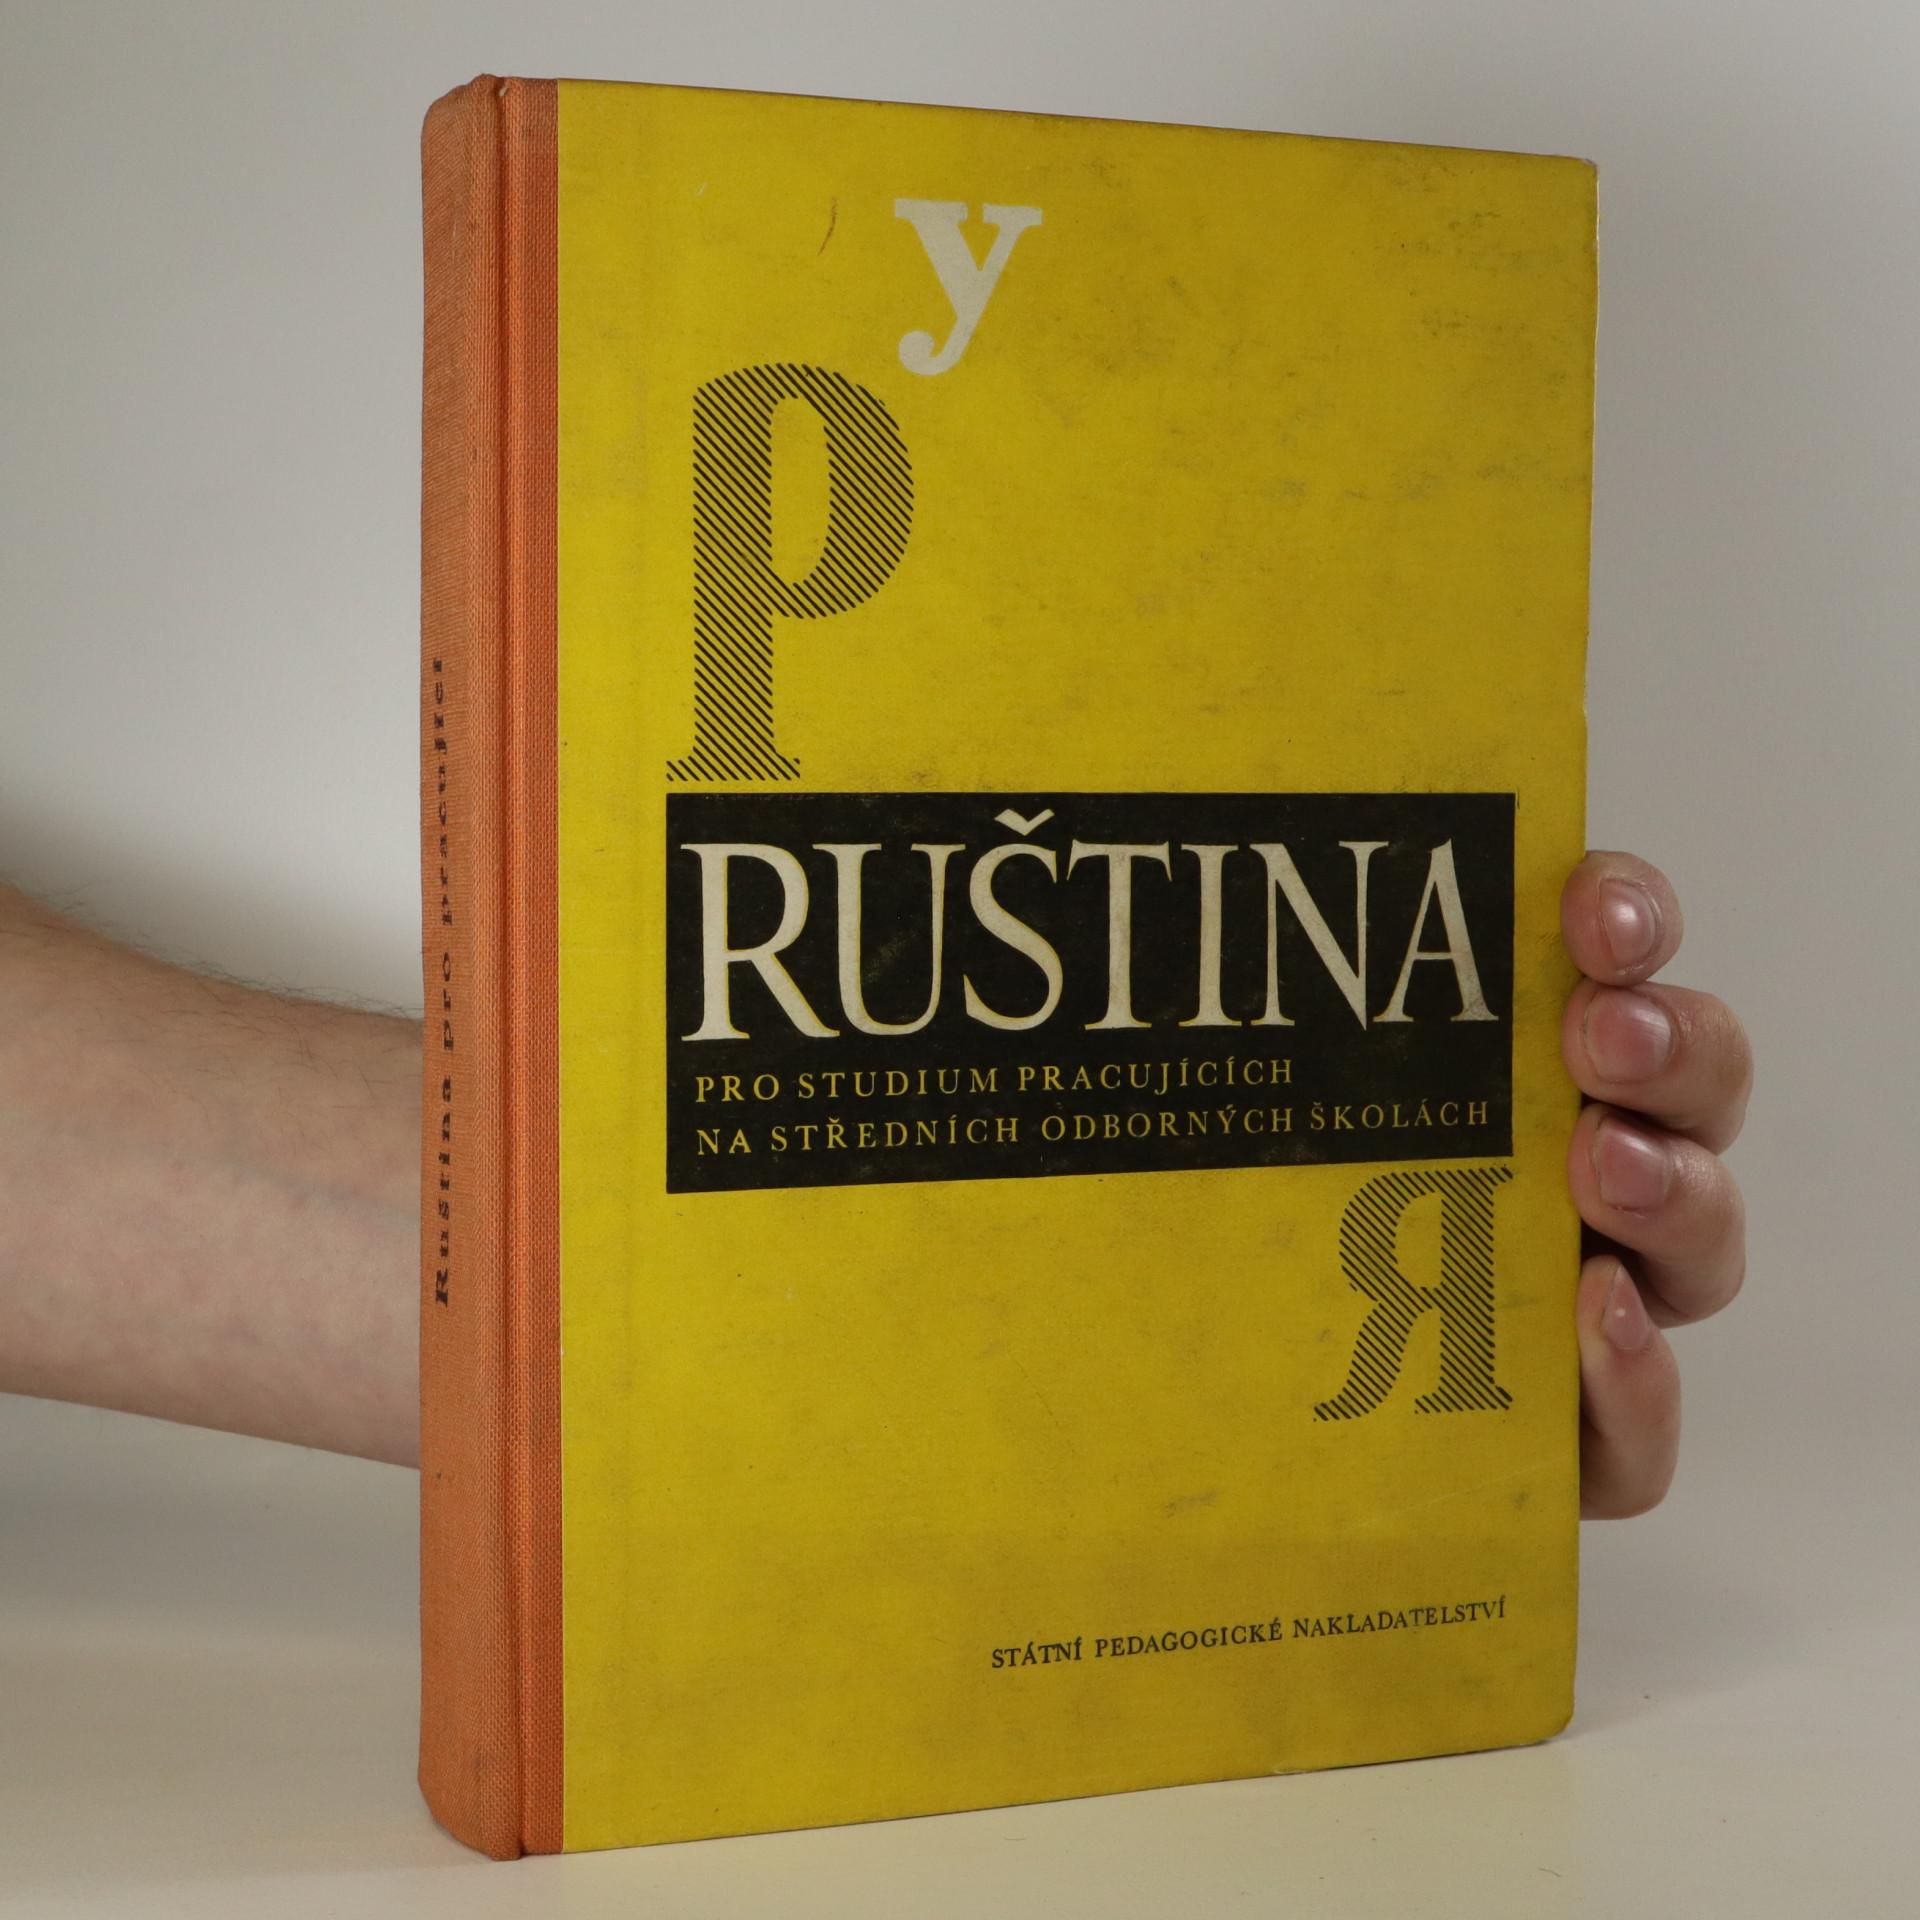 antikvární kniha Ruština, 1965